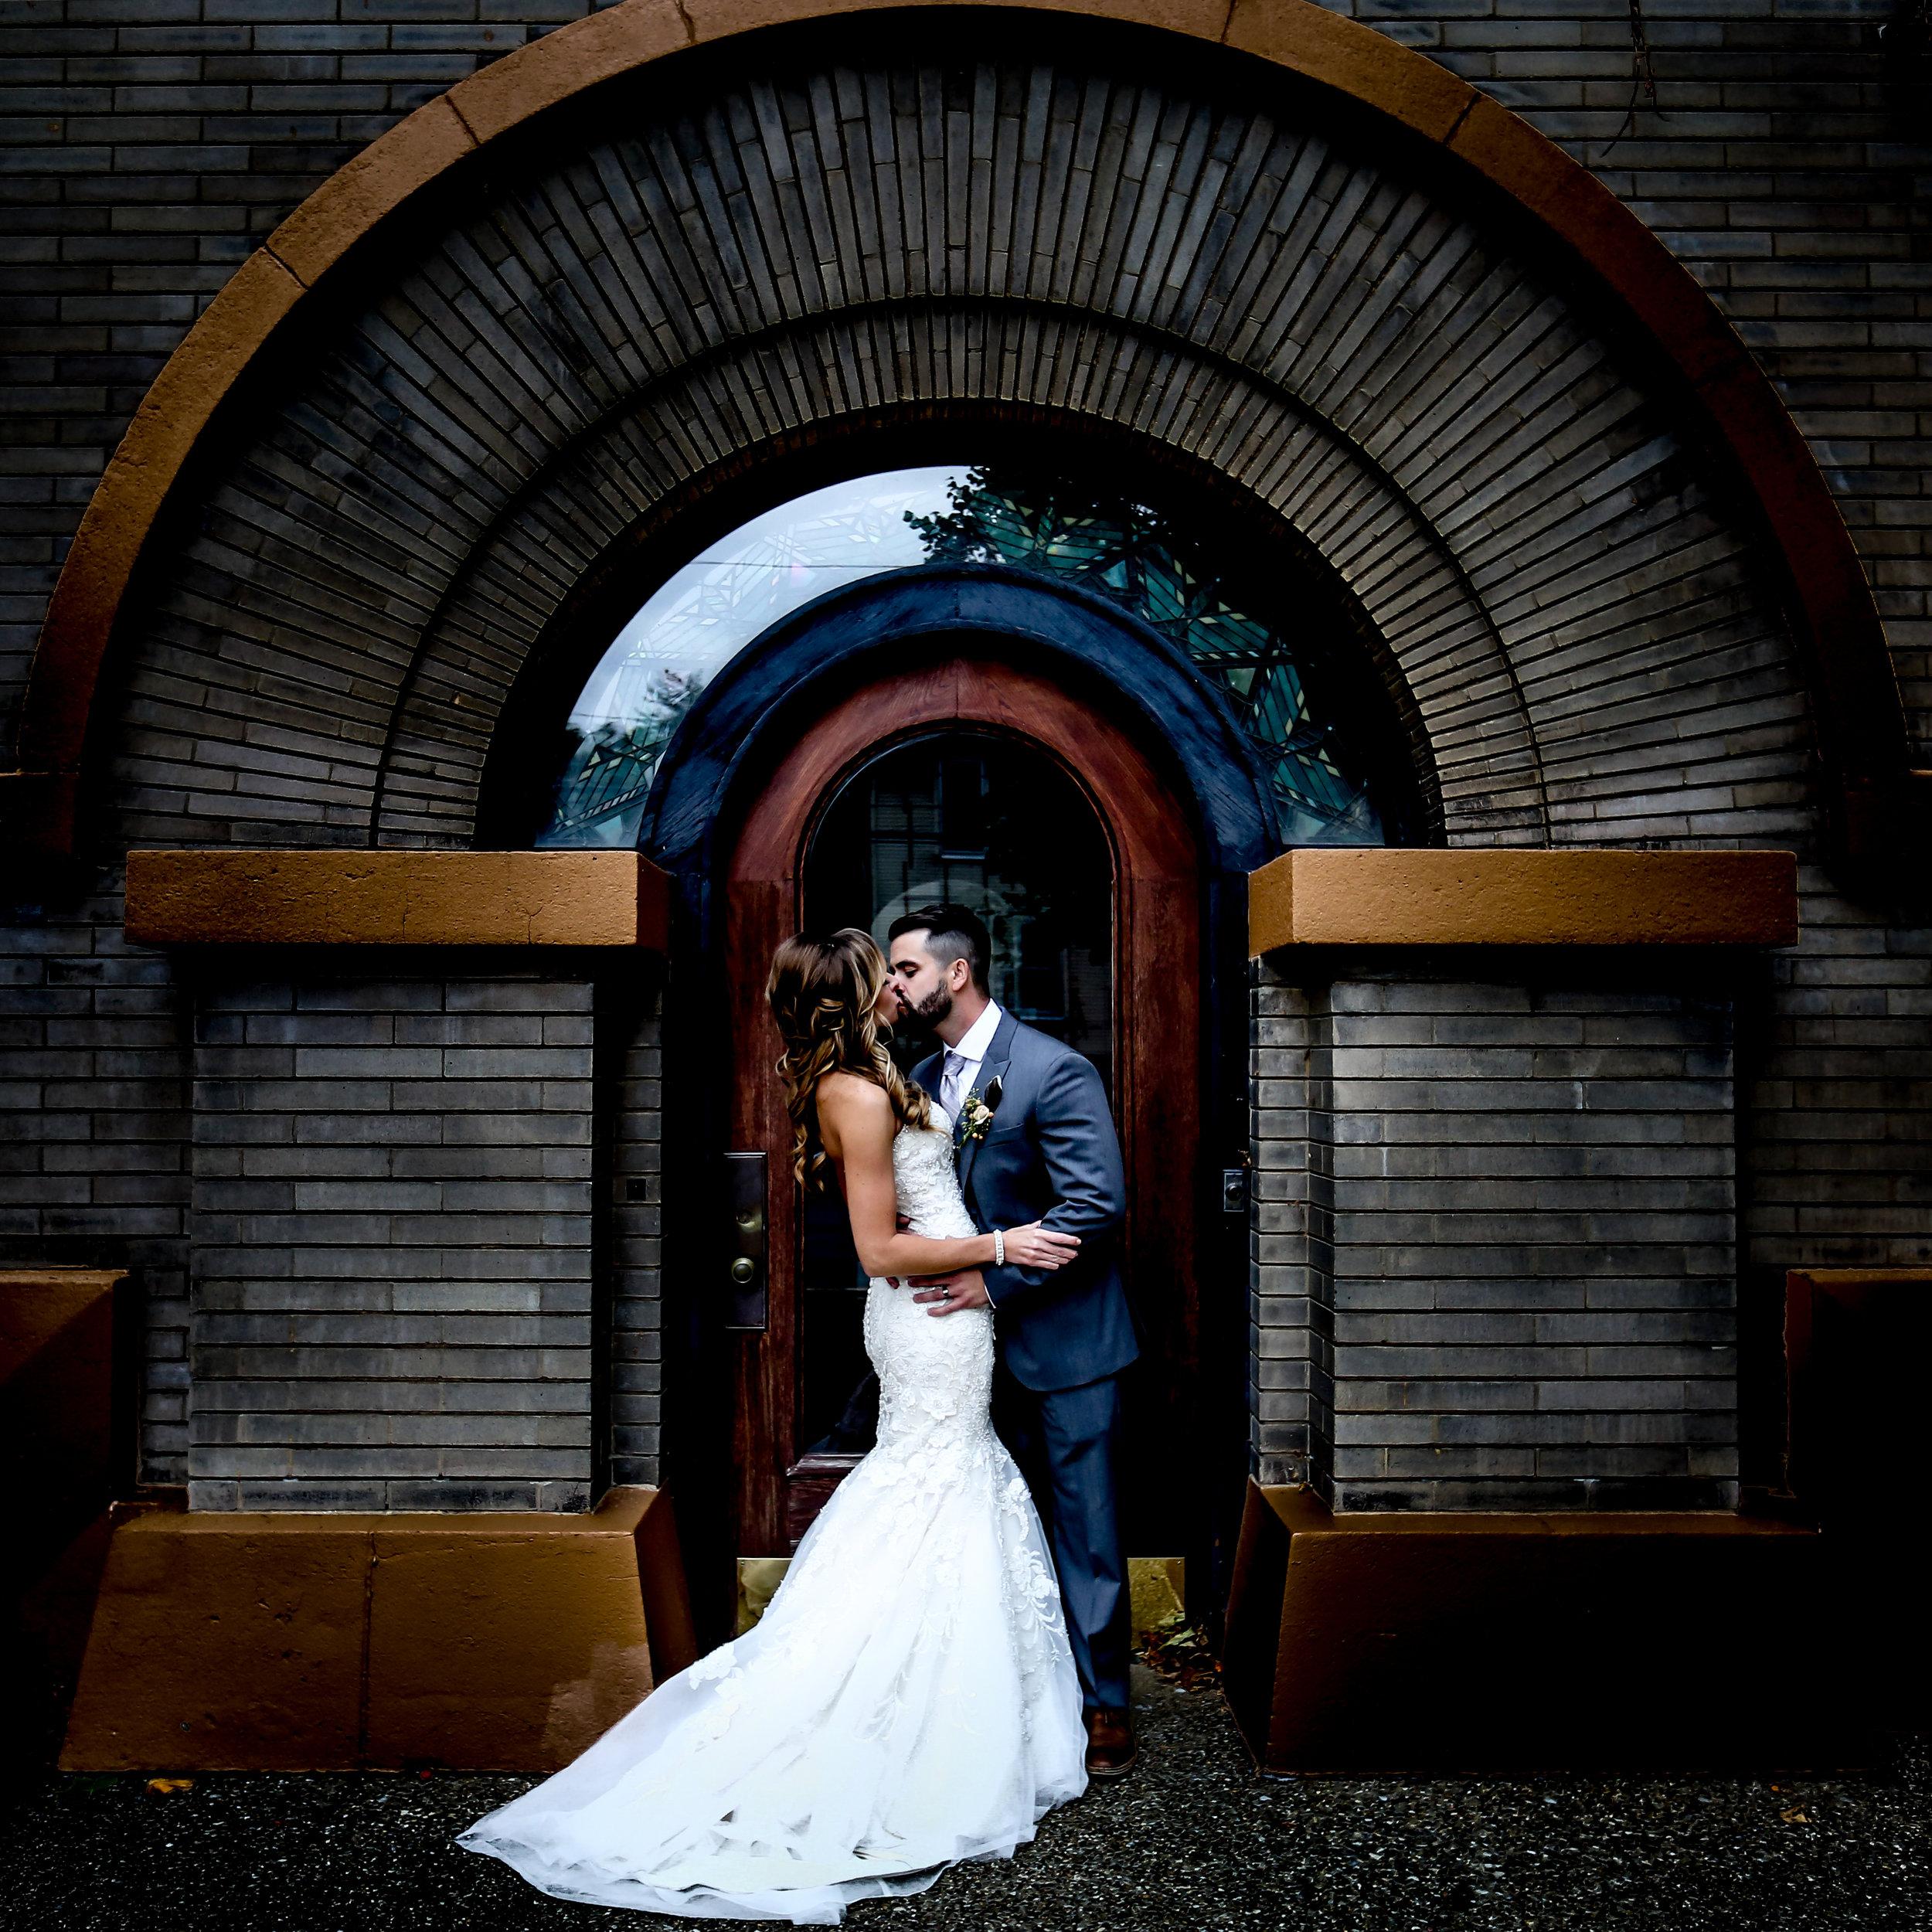 WeddingWebsite-21.jpg